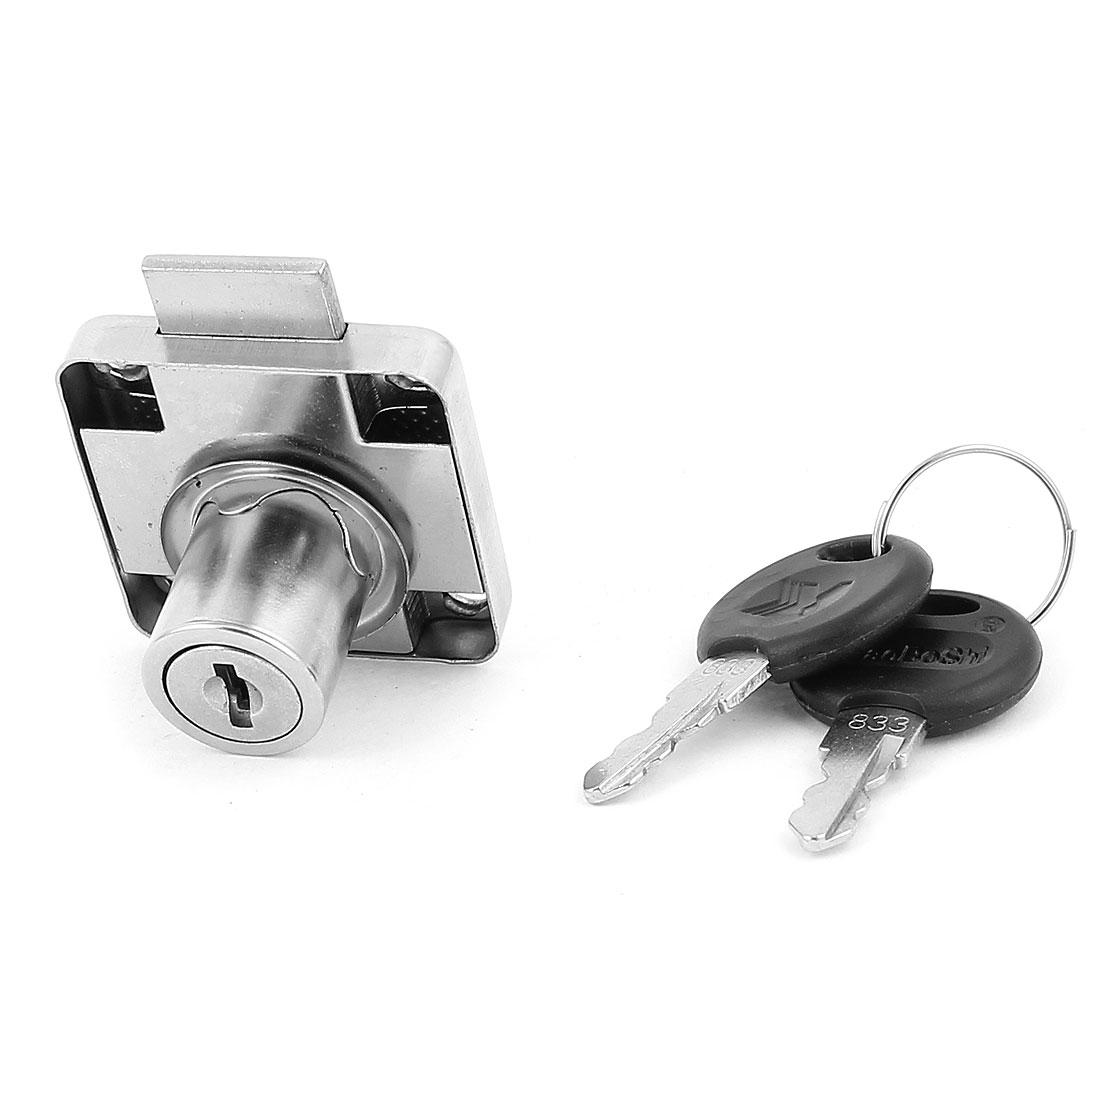 40mm x 40mm Wardrobe Cabinet Drawer Safe Tubular Cylinder Lock Silver Tone